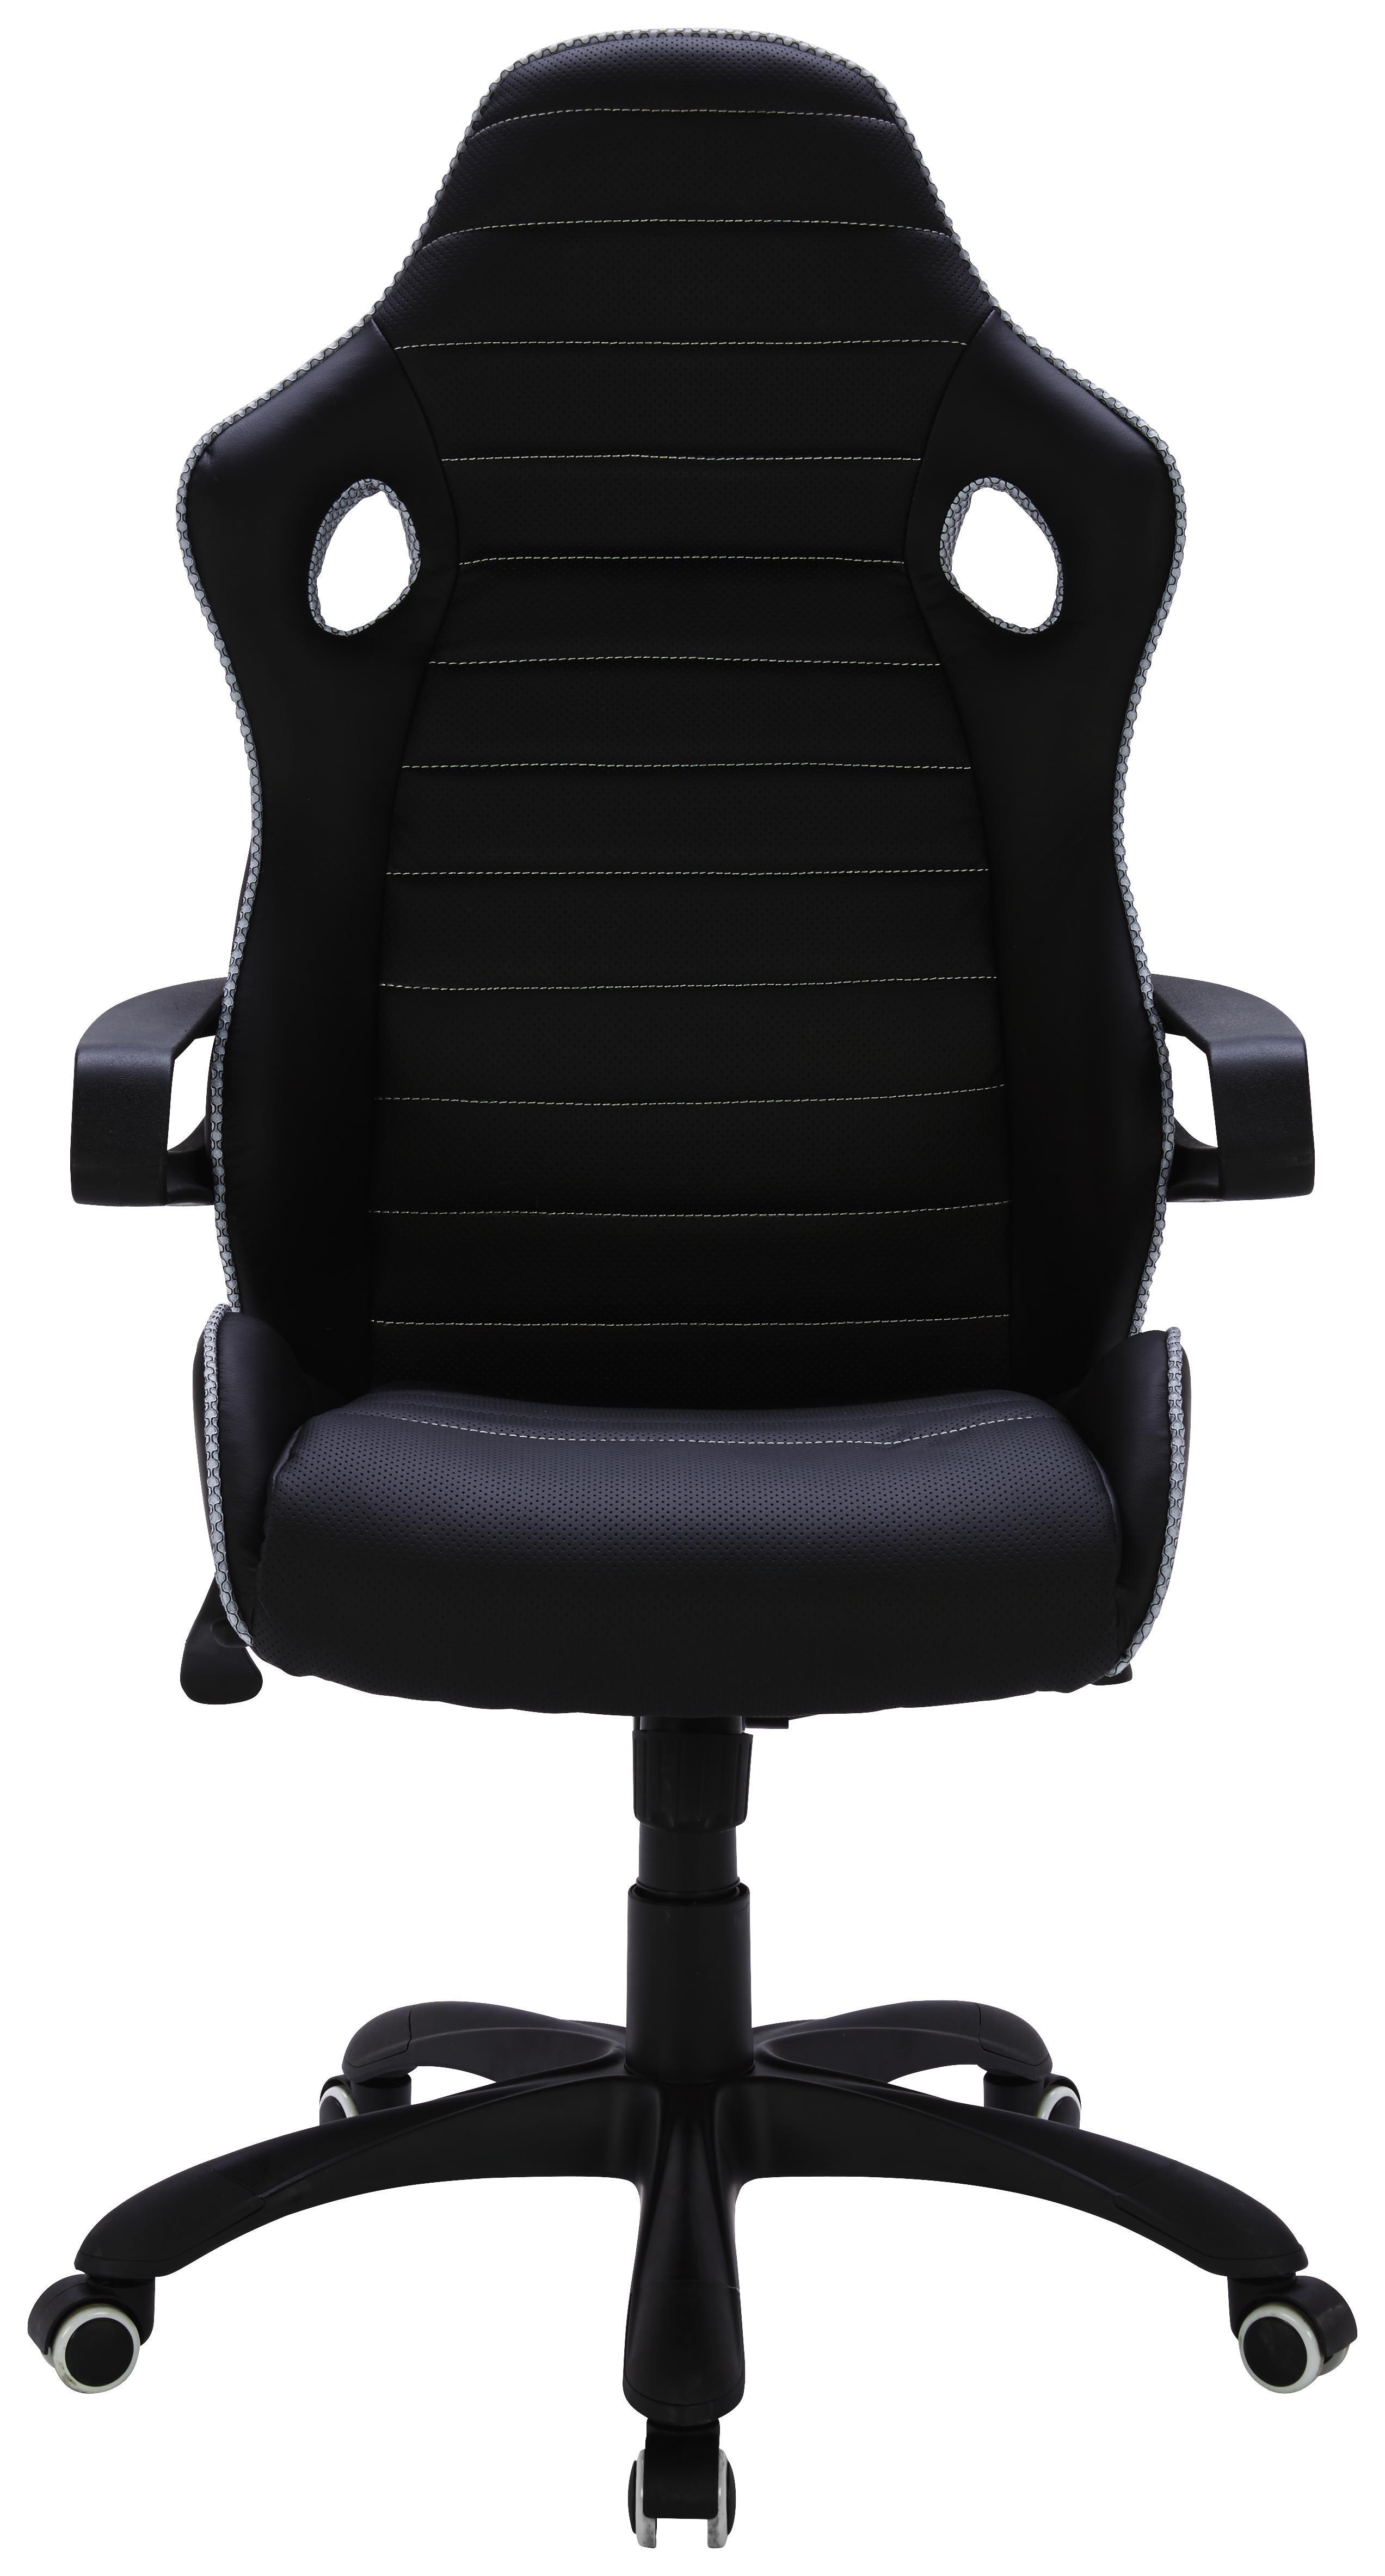 Xxxlutz BürosesselBürostuhl Bürostühleamp; Online Zubehör Kaufen MpqSVLzGU